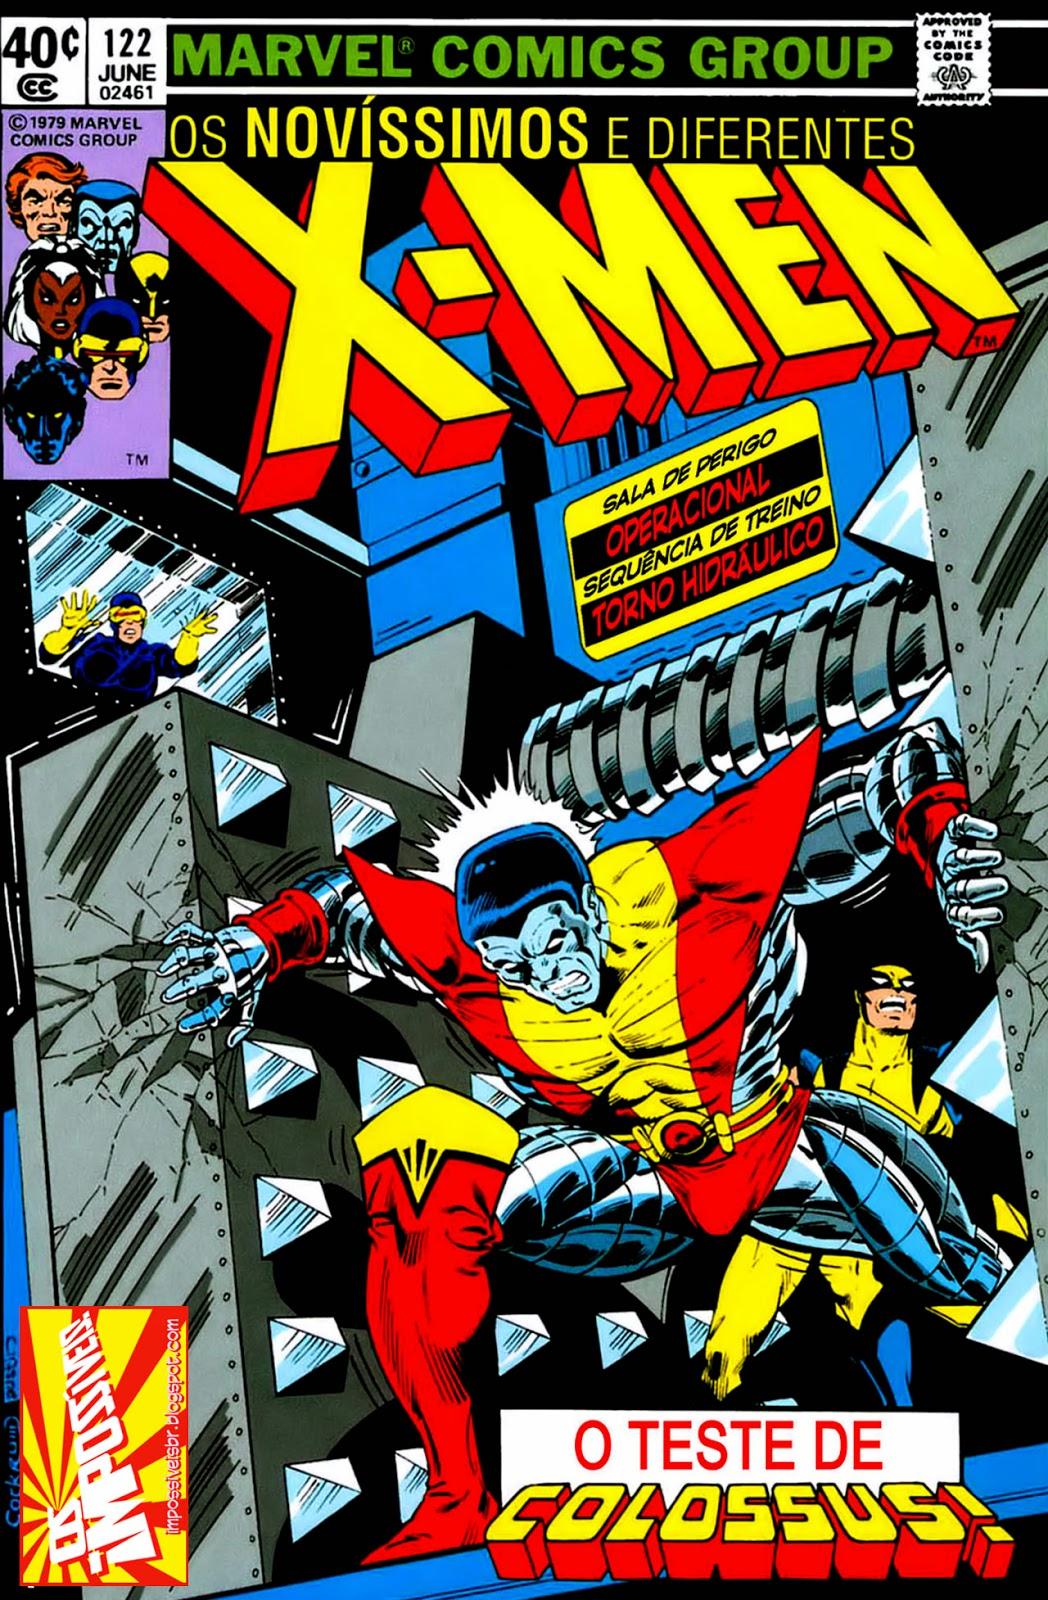 http://www.mediafire.com/download/2dadikysl60dcpk/Os.Fabulosos.X-Men.(X-Men.V1).122.HQBR.09NOV13.Os.Impossiveis.cbr